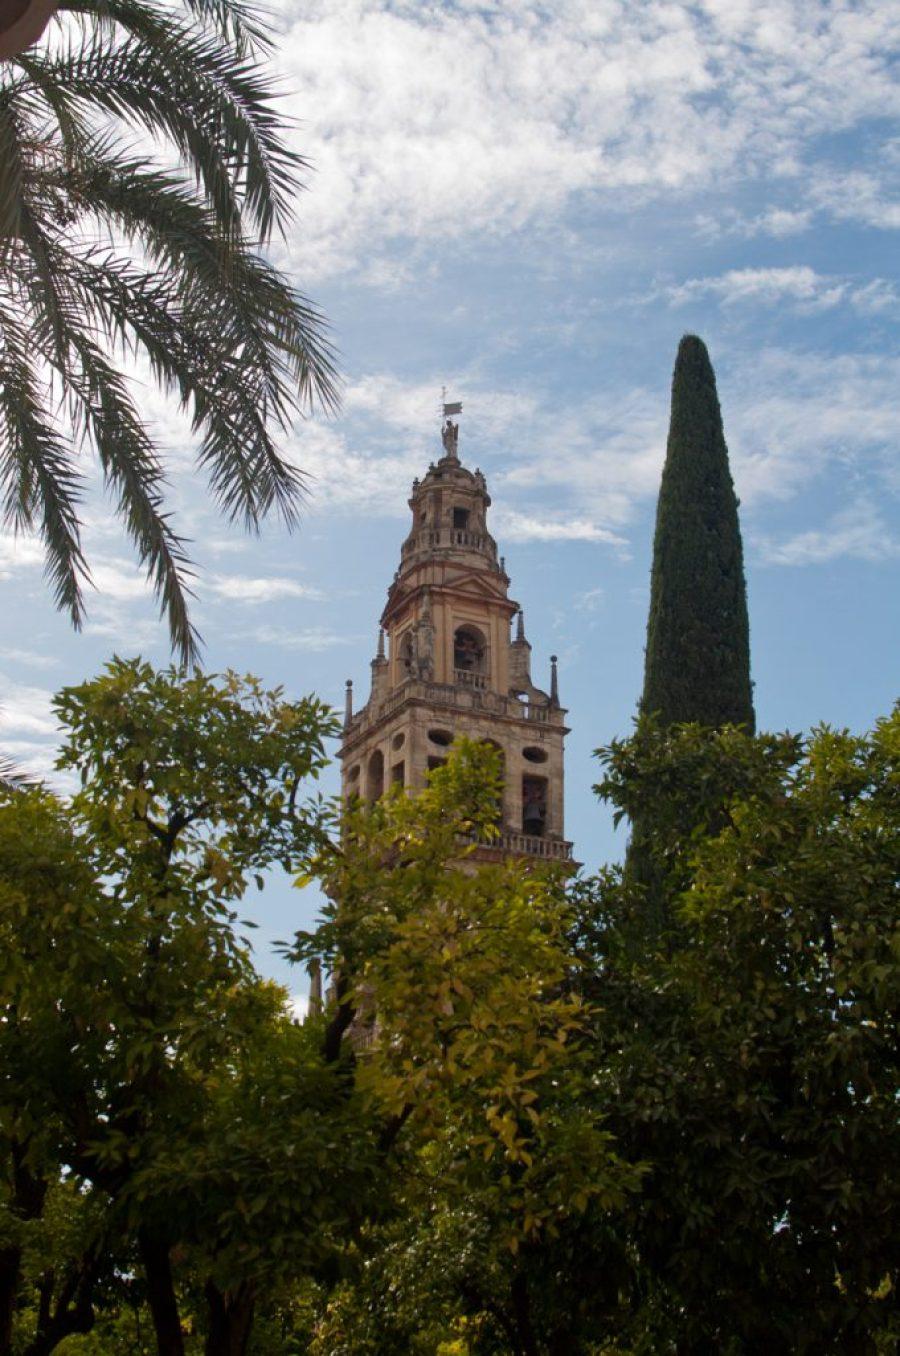 Great 8 day spain roadtrip itinerary - Cordoba